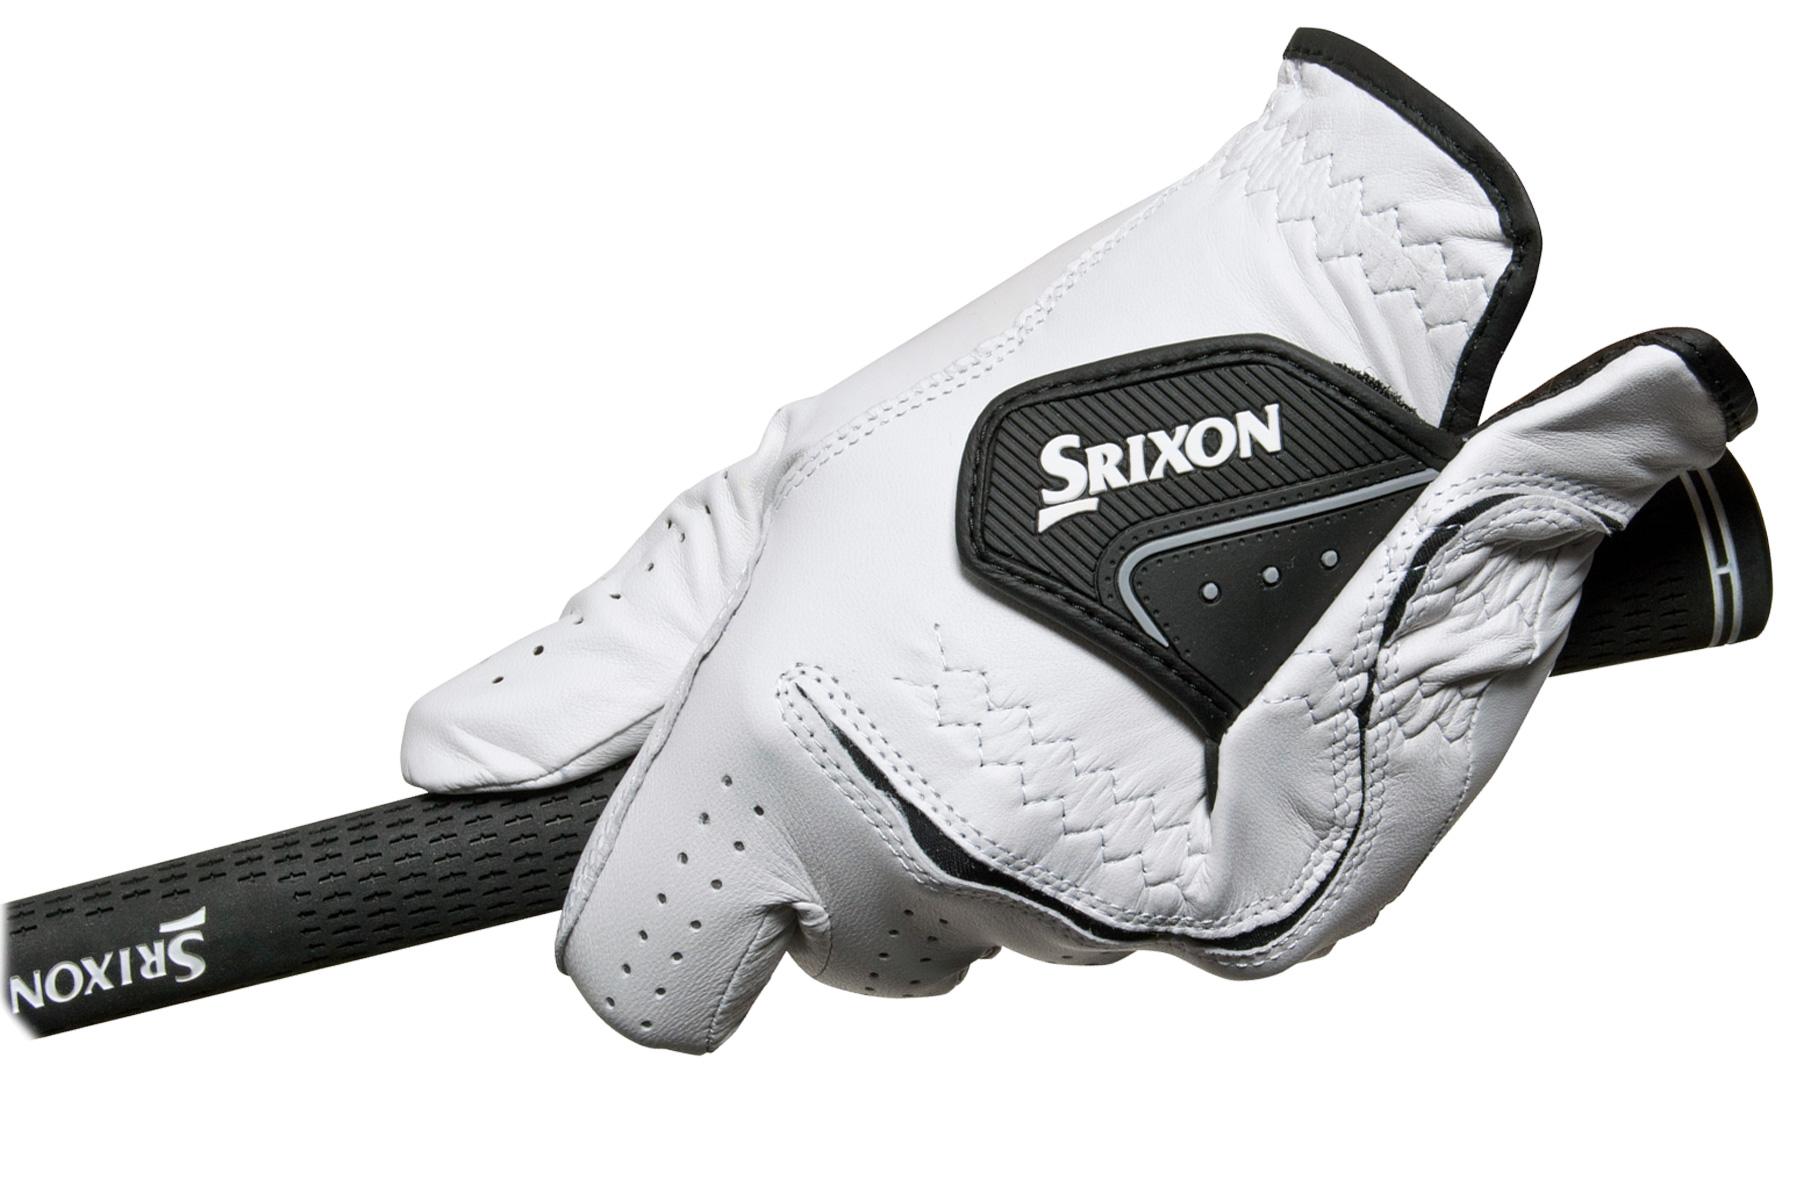 Ladies leather golf gloves uk - Srixon Cabretta Leather Glove Srixon Cabretta Leather Glove